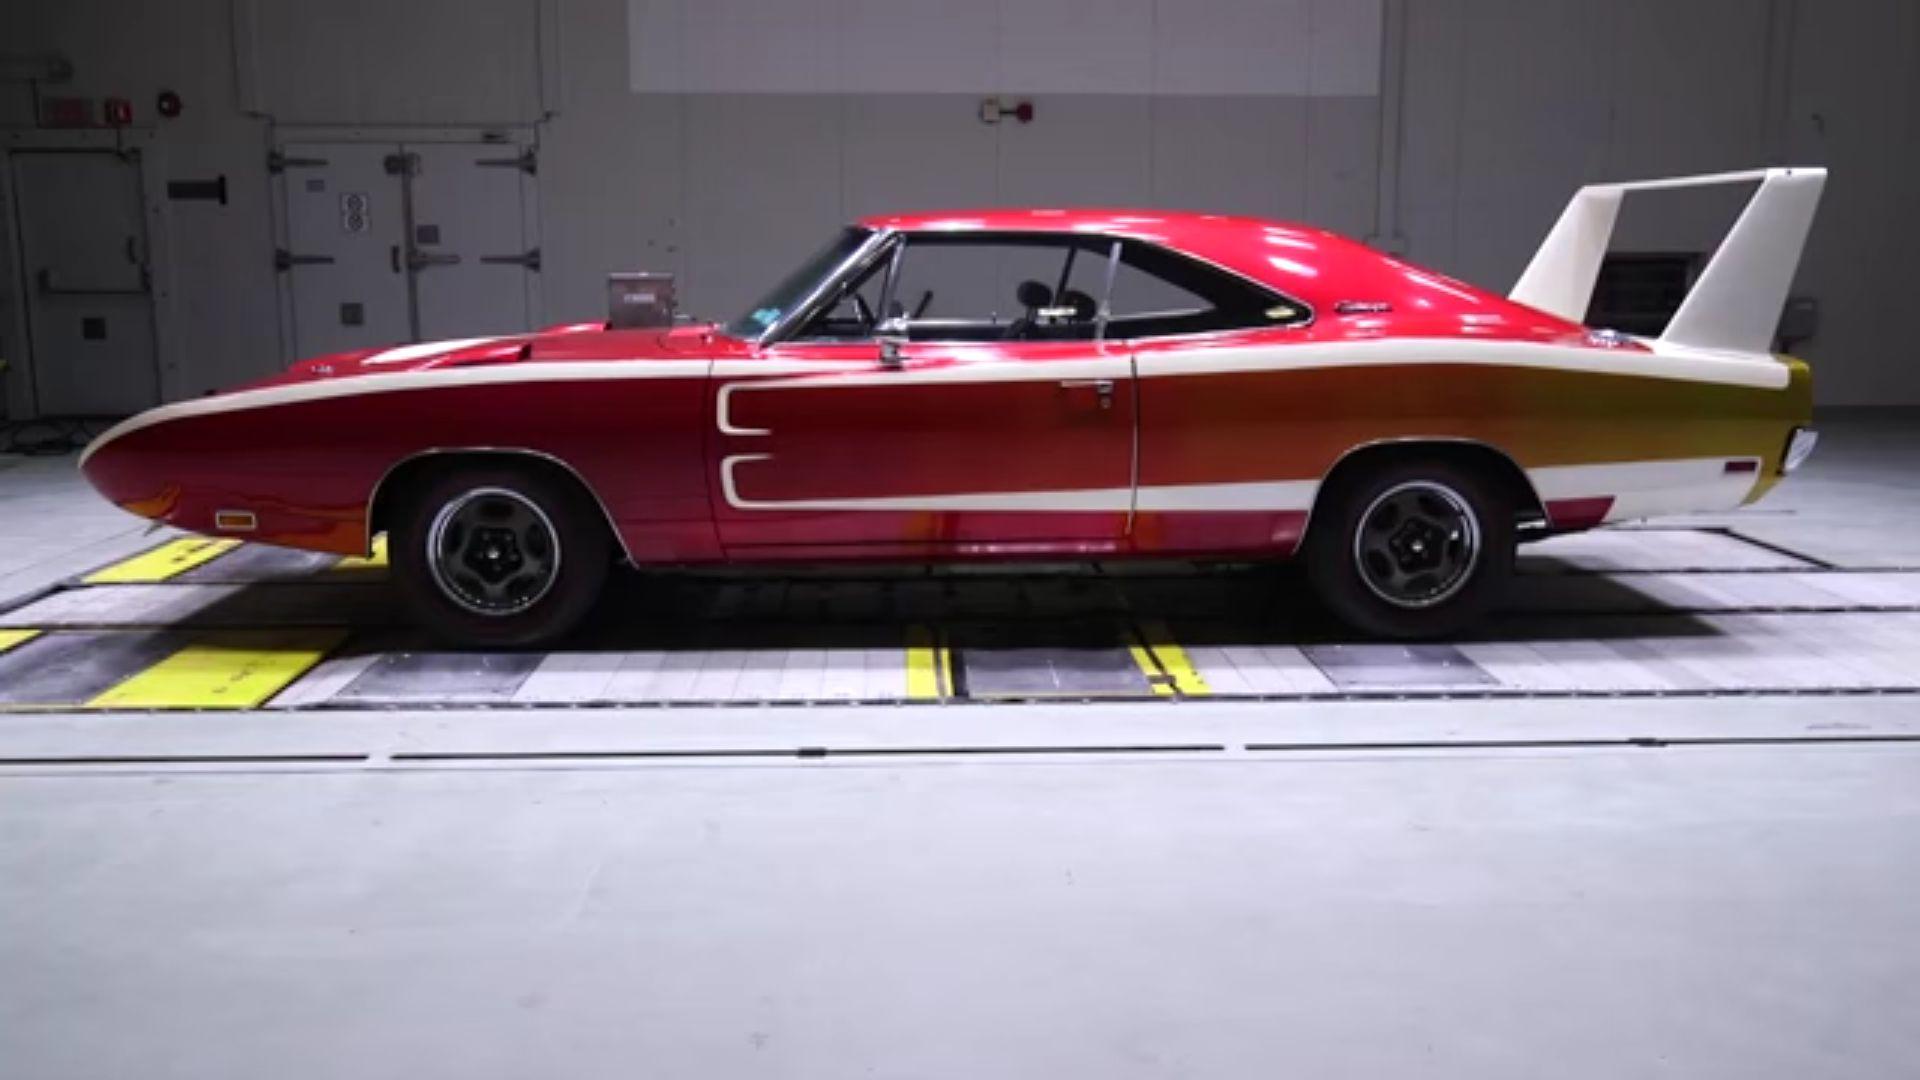 Wind Tunnel Battle 1969 Dodge Charger Daytona Vs 2016 Hellcat